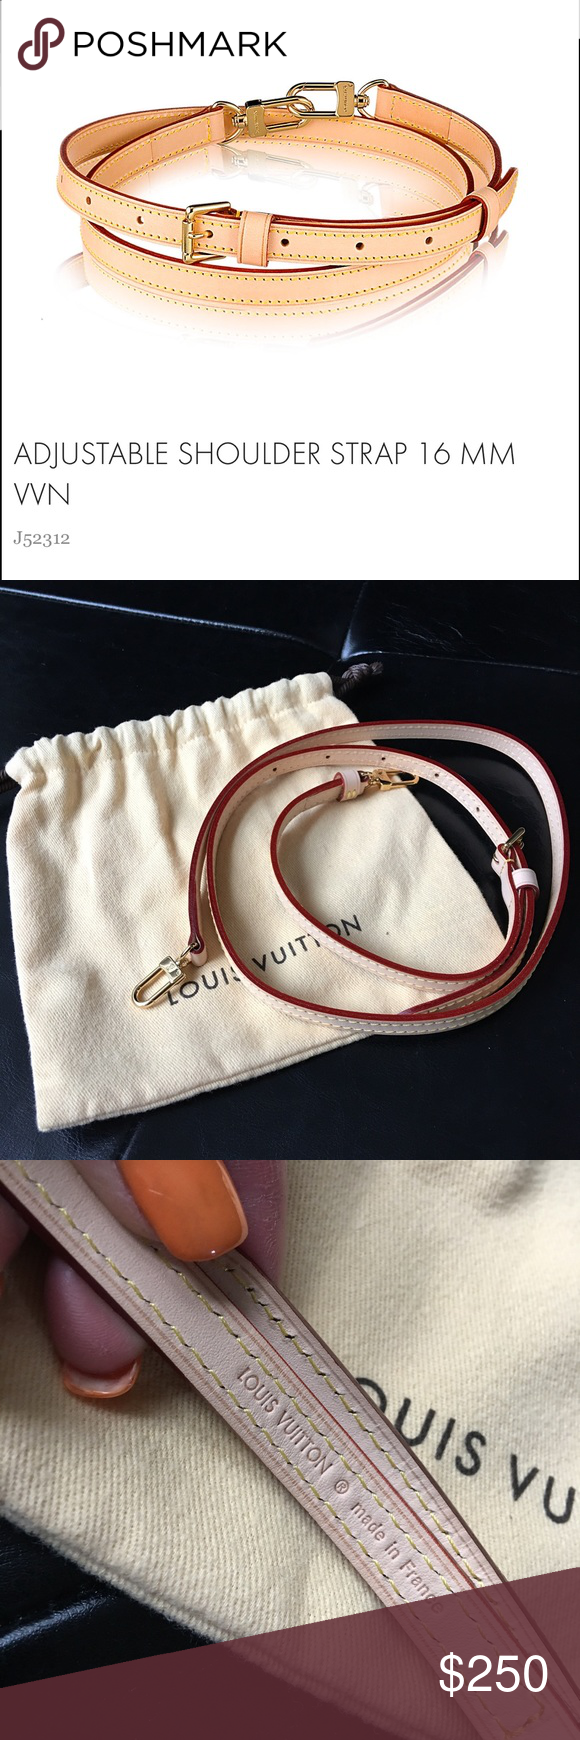 ec13481940 Louis Vuitton adjustable shoulder strap 16mm vvn Worn twice for my ...